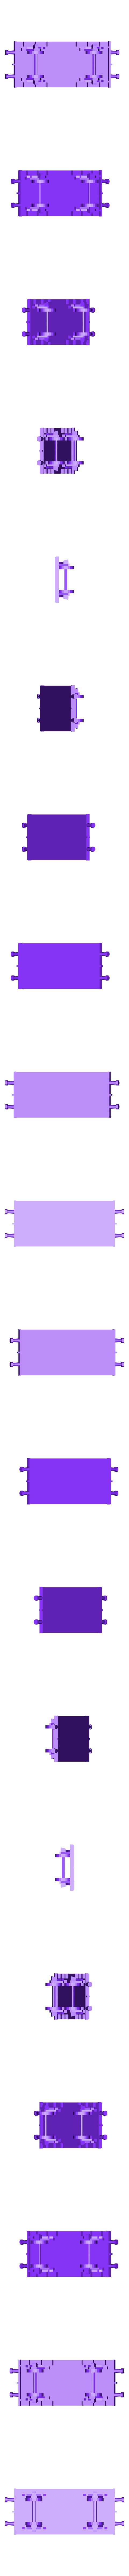 wsNTV200-Niz.stl Download free STL file Boxcar 1:200 • 3D printing template, polkin